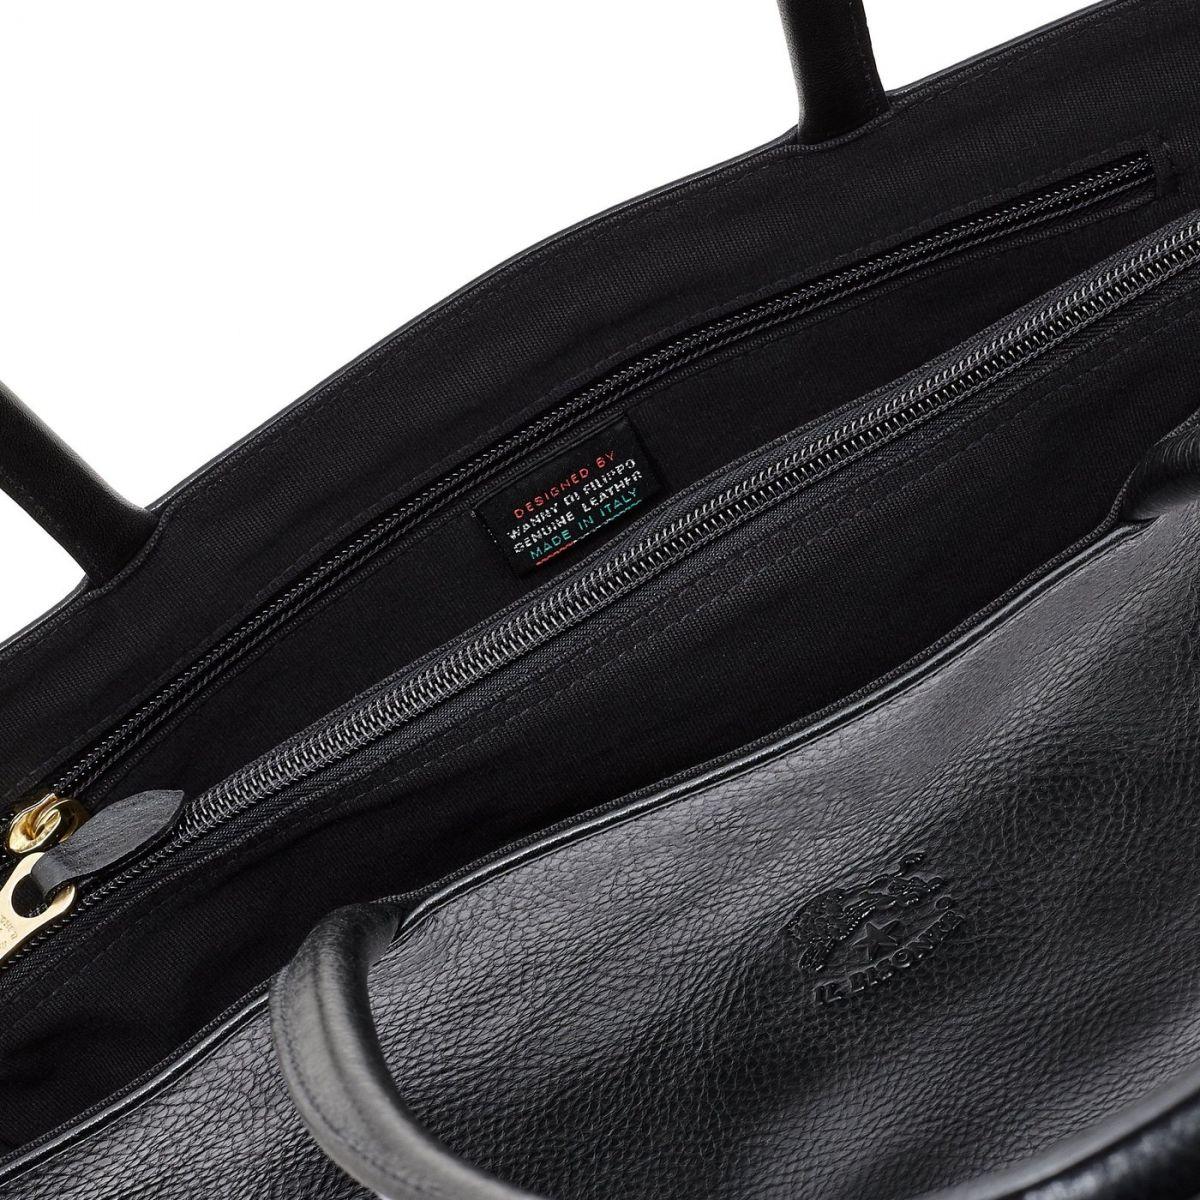 Women's Shoulder Bag in Cowhide Double Leather BSH007 color Black | Details